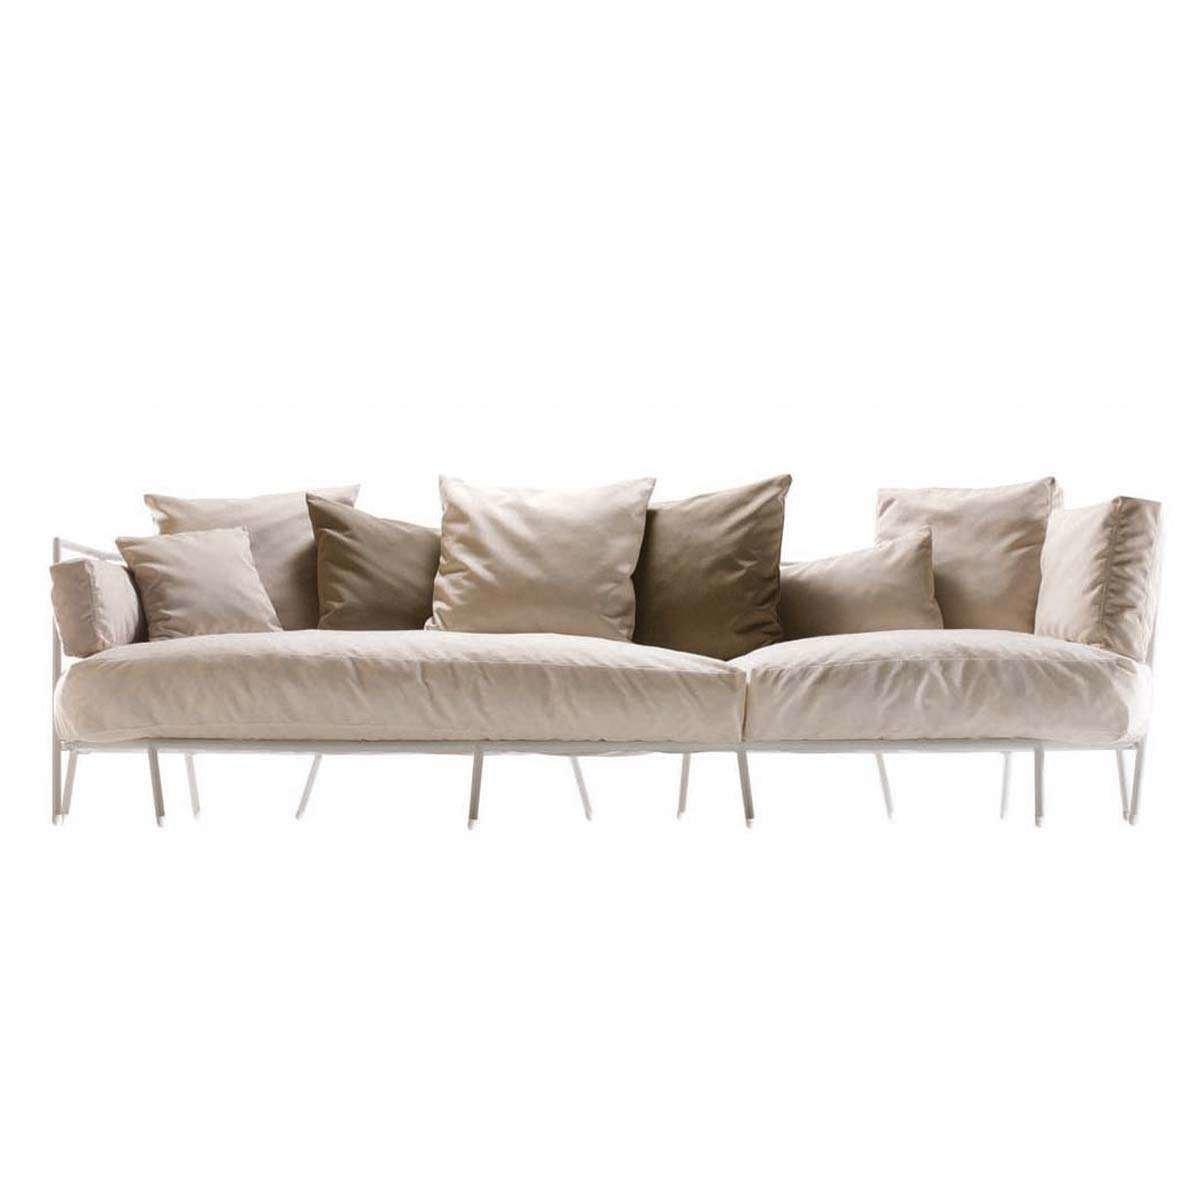 sofa lounger outdoor seat en eindhoven telefoonnummer shop modern furniture lounge dwell